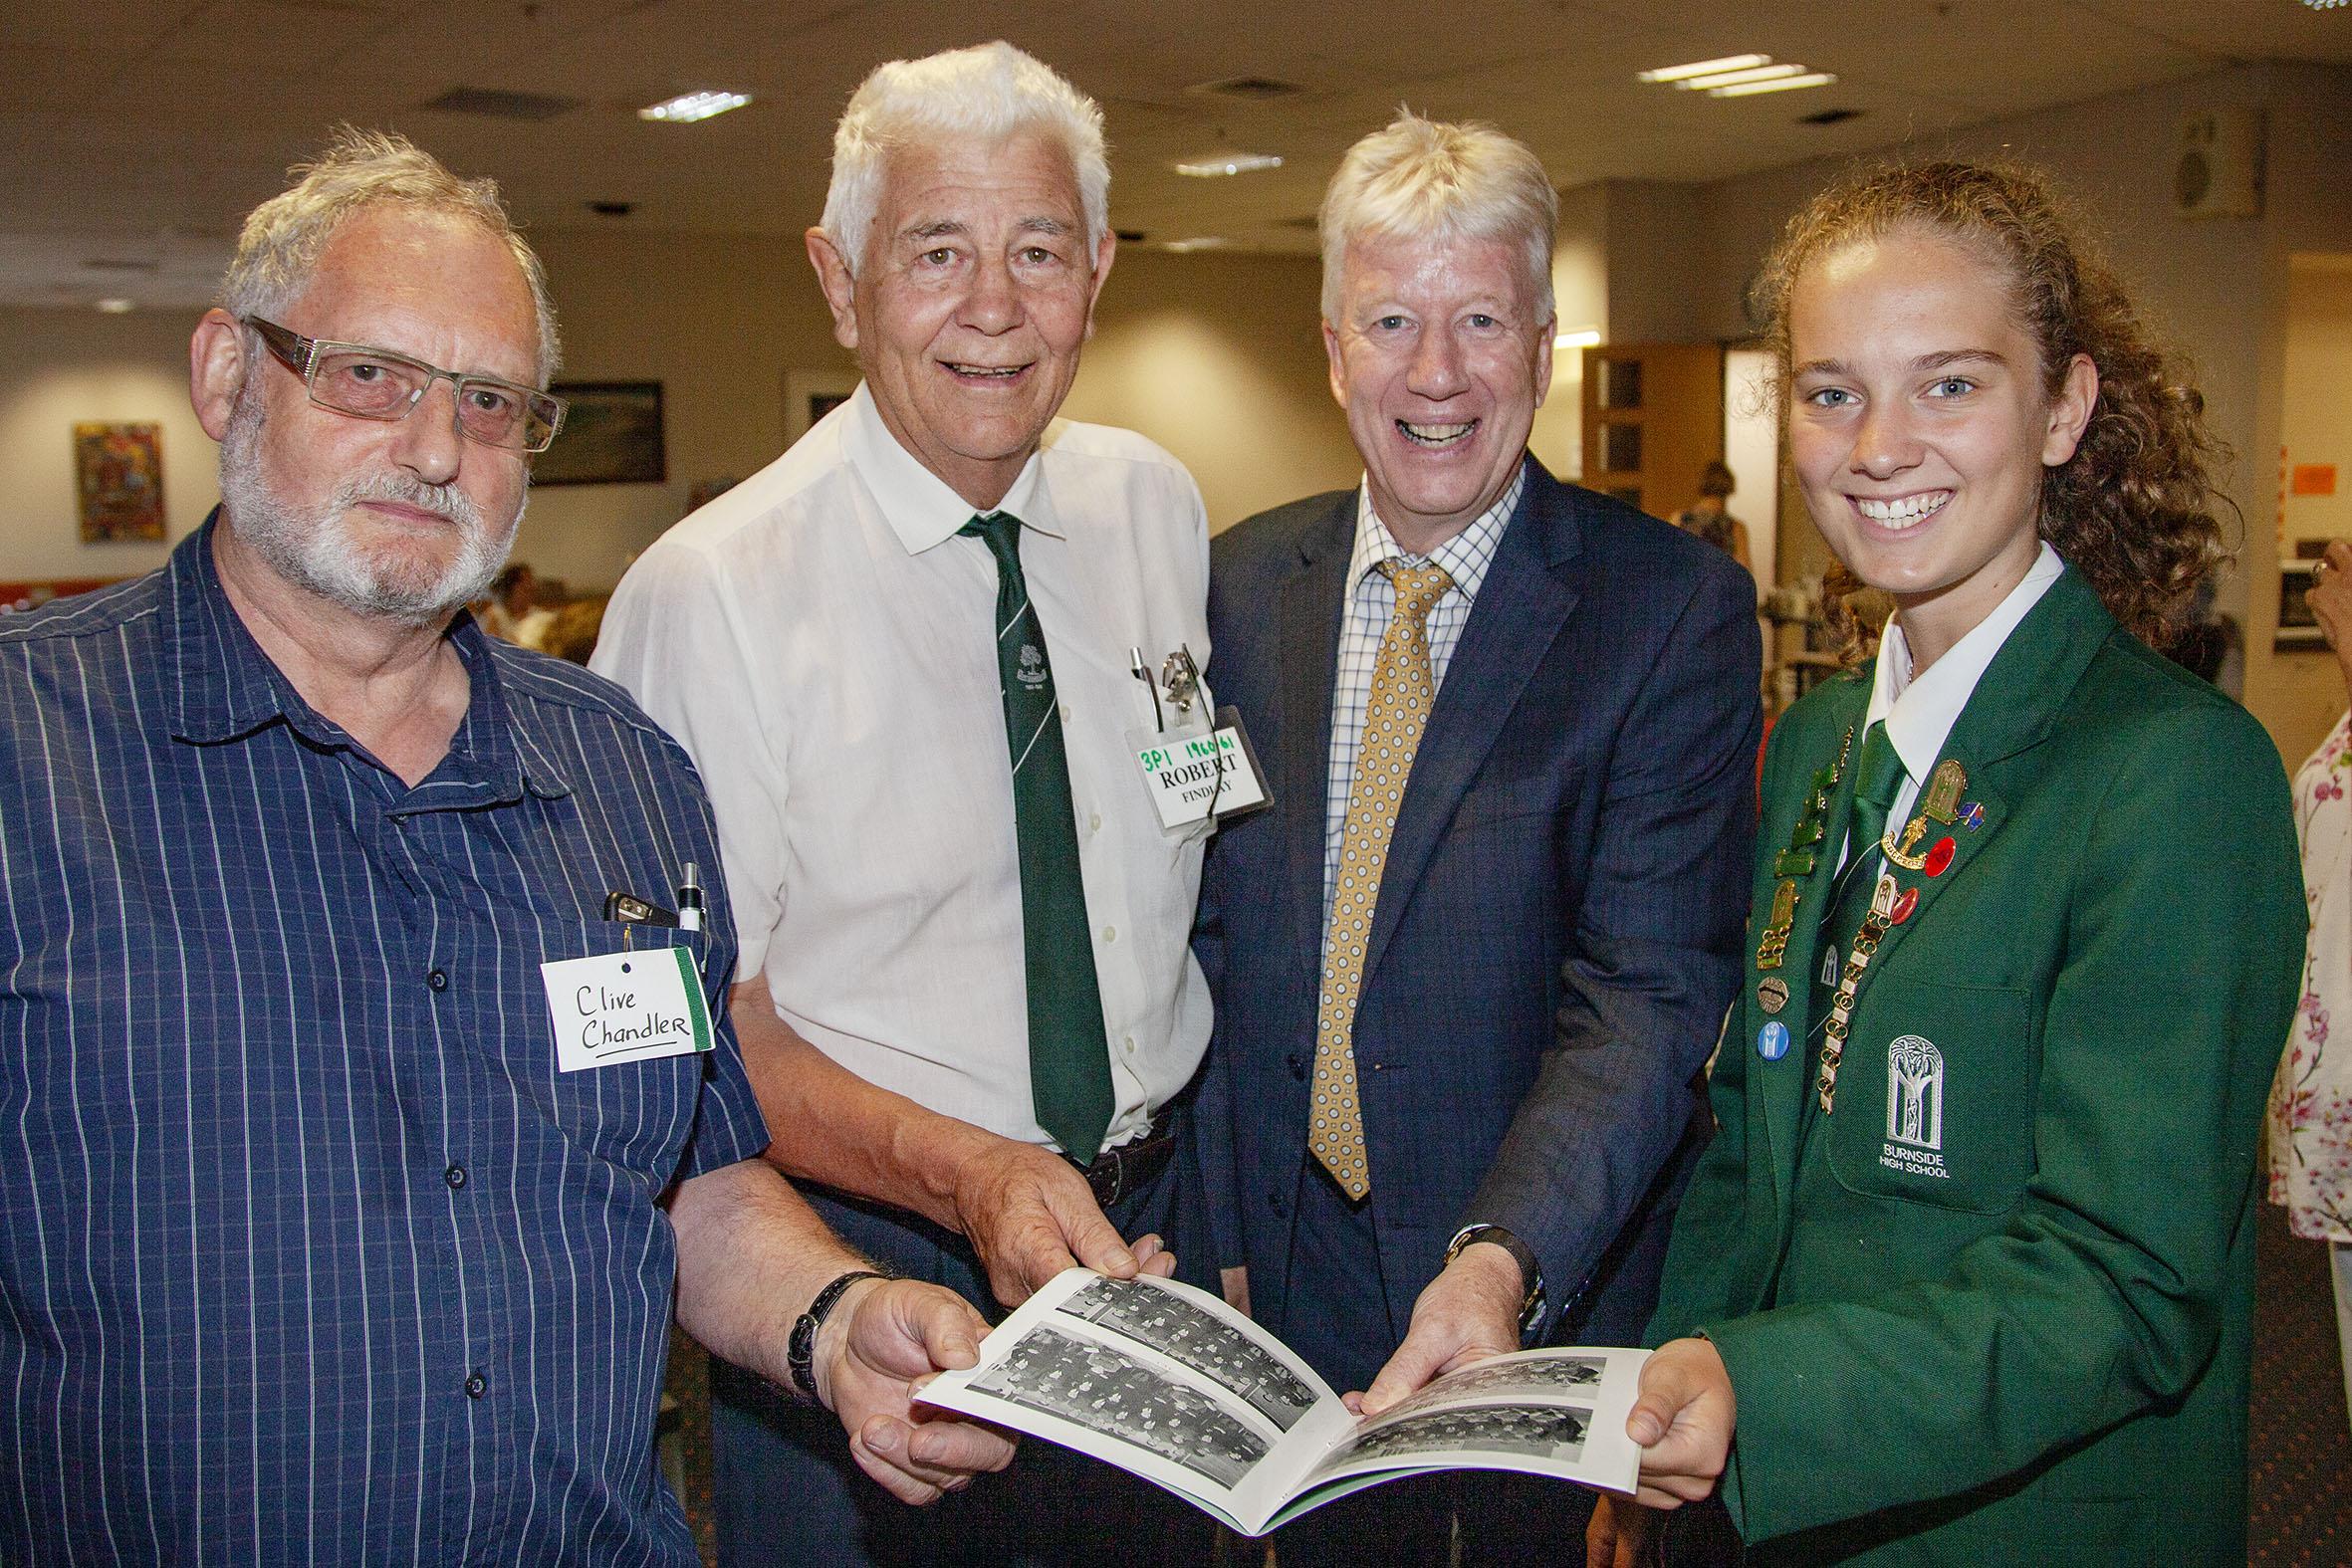 Clive Chandler, Robert Findlay, principal Phil Holstein and deputy head girl Emma Hollingworth...